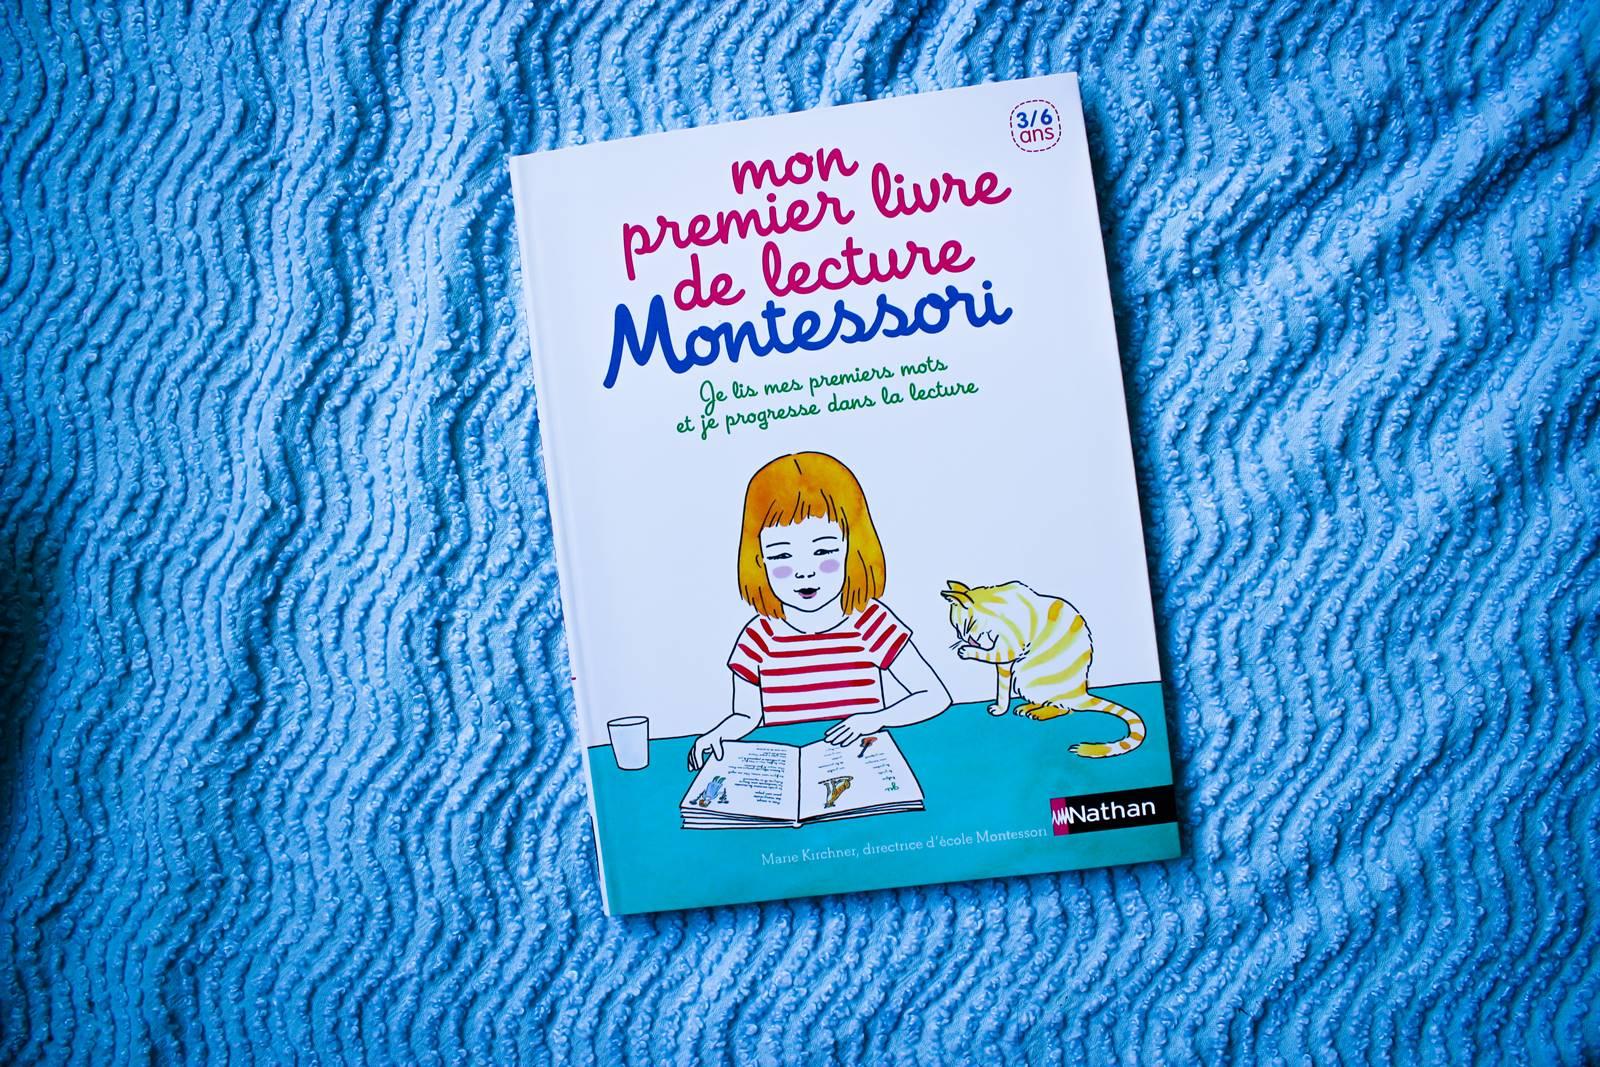 Blog manuelle livre scolaire ief homescooling 7